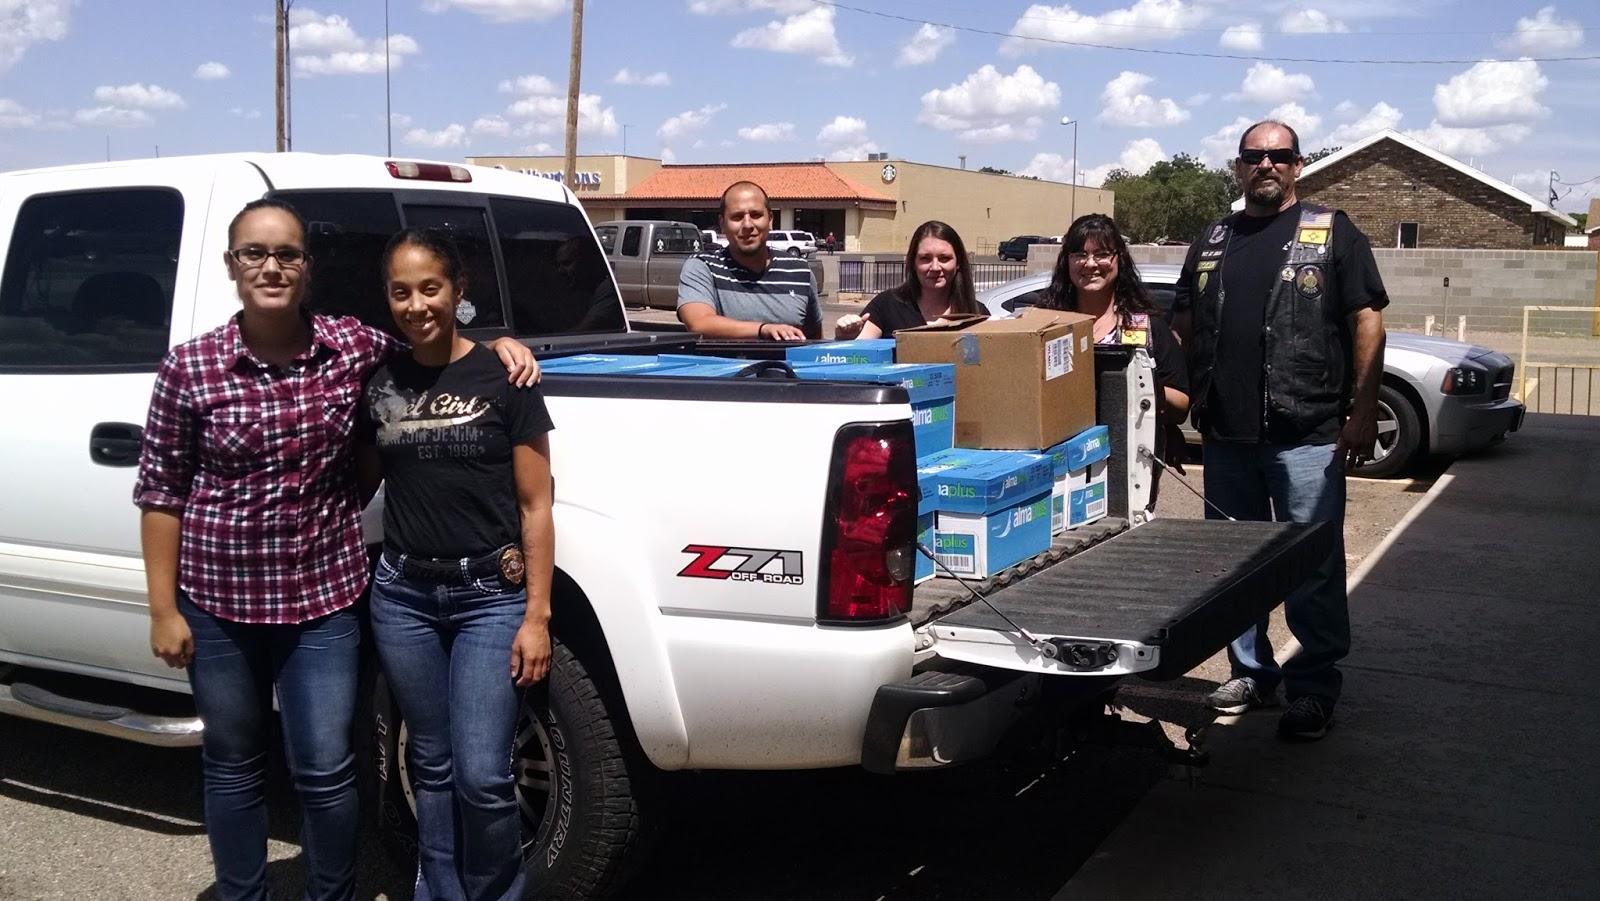 New Mexico Motor Vehicle Division Albuquerque Nm >> Motor Vehicle Department Clovis Nm - impremedia.net